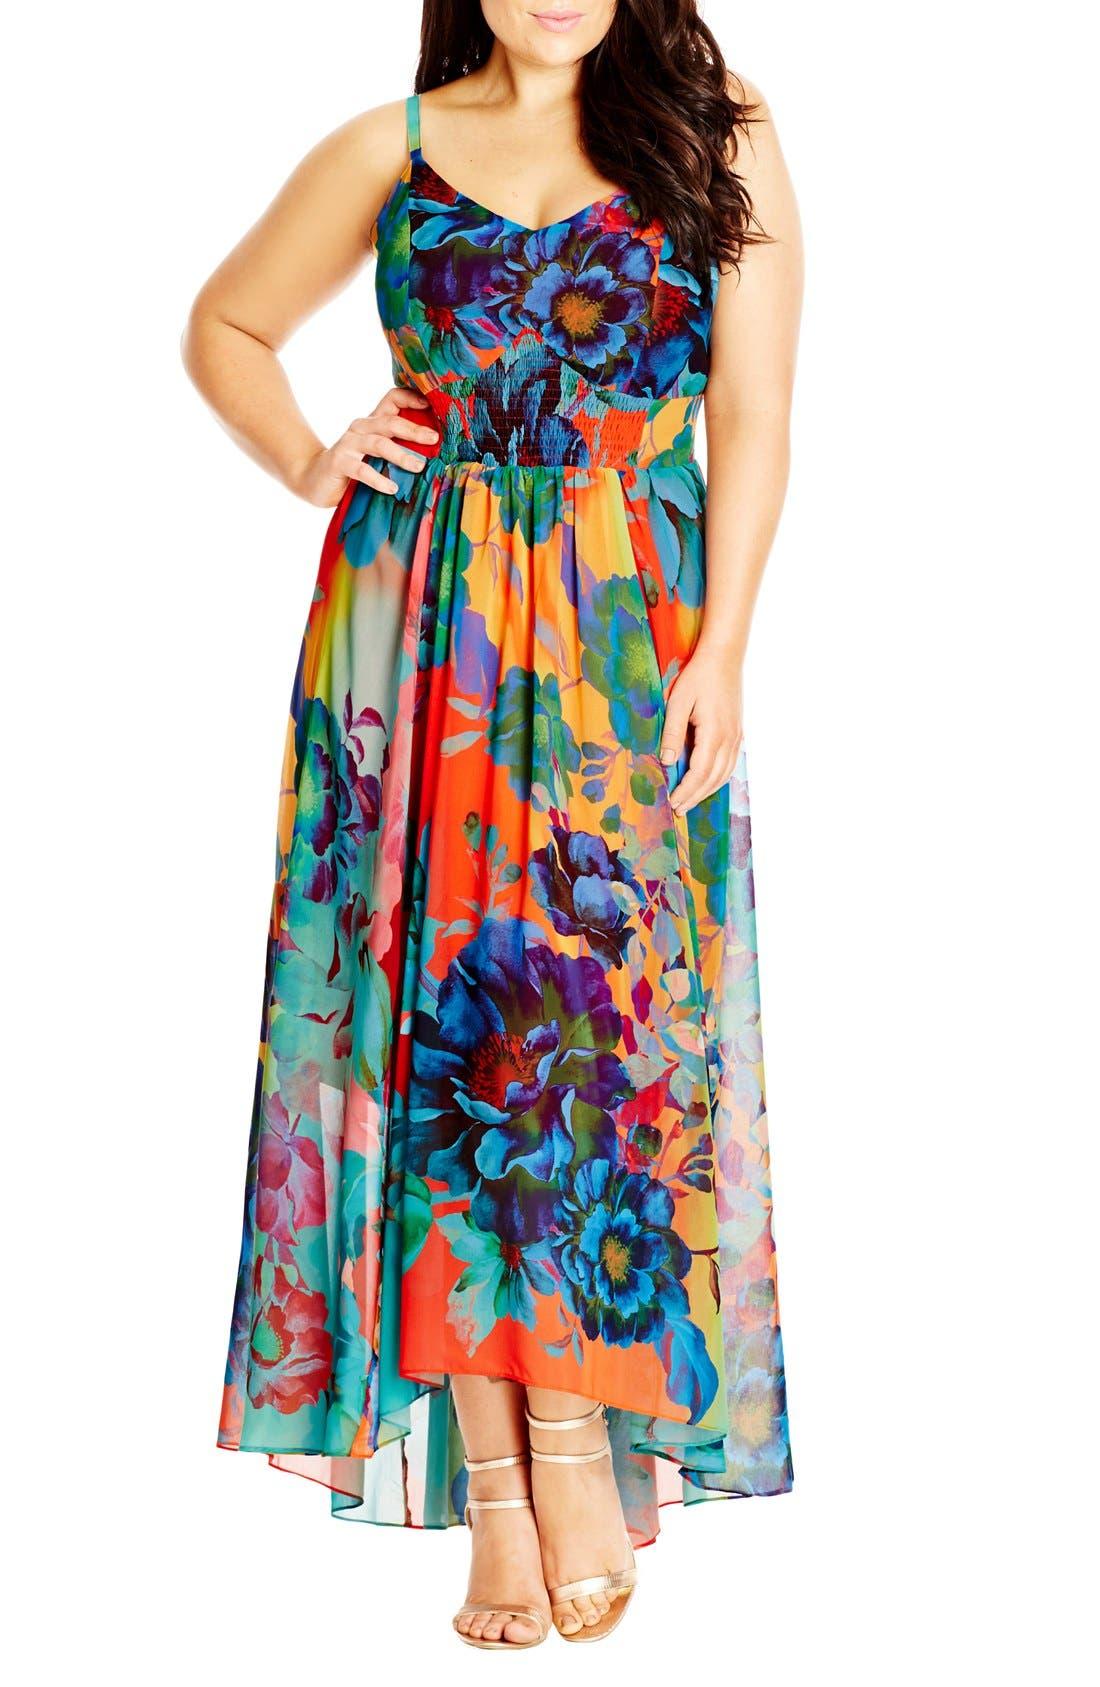 City Chic 'Hot Summer Days' Print High/Low Maxi Dress ...